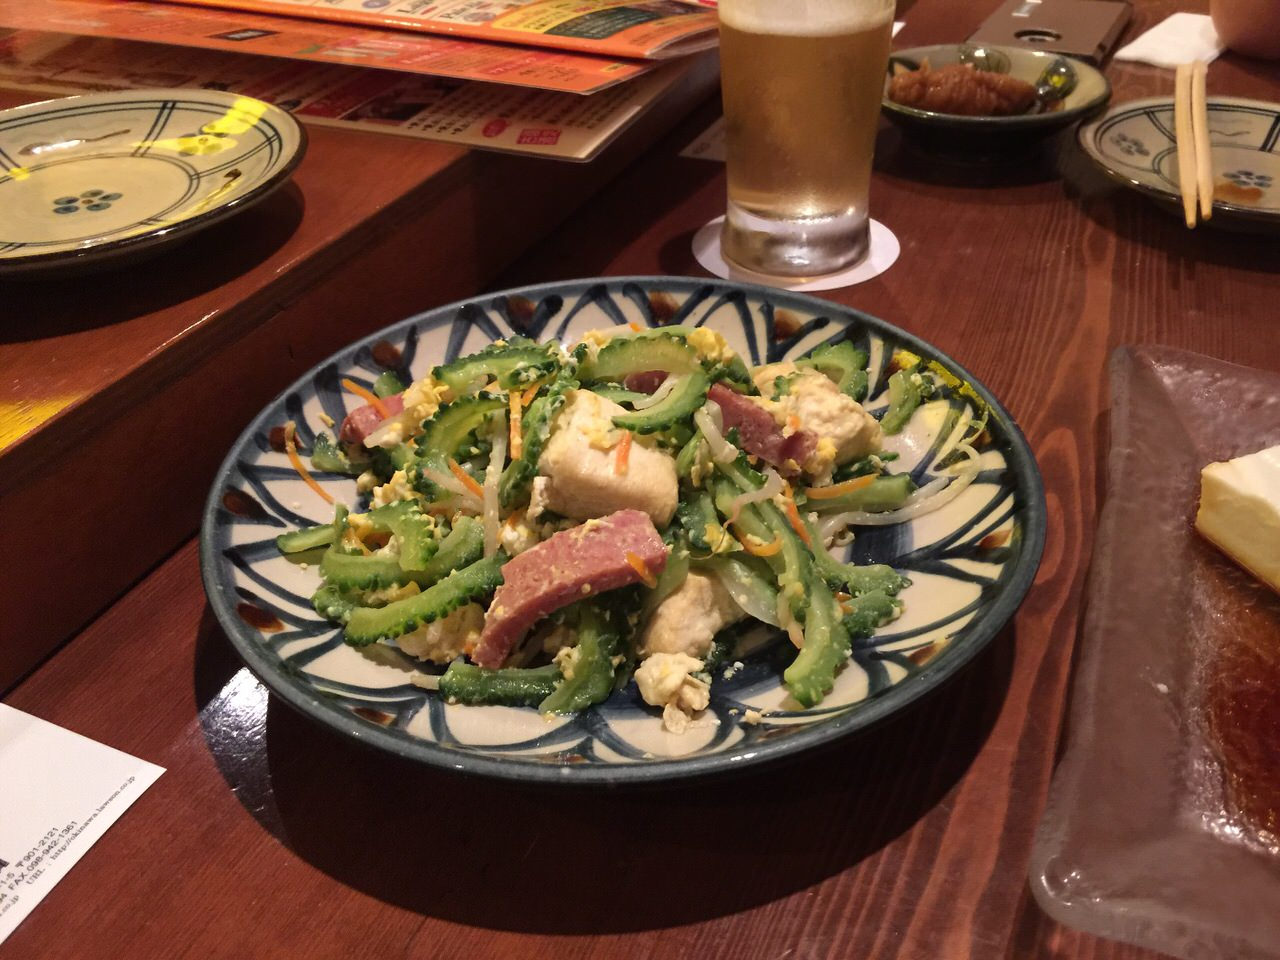 Momogami okinawa 7700